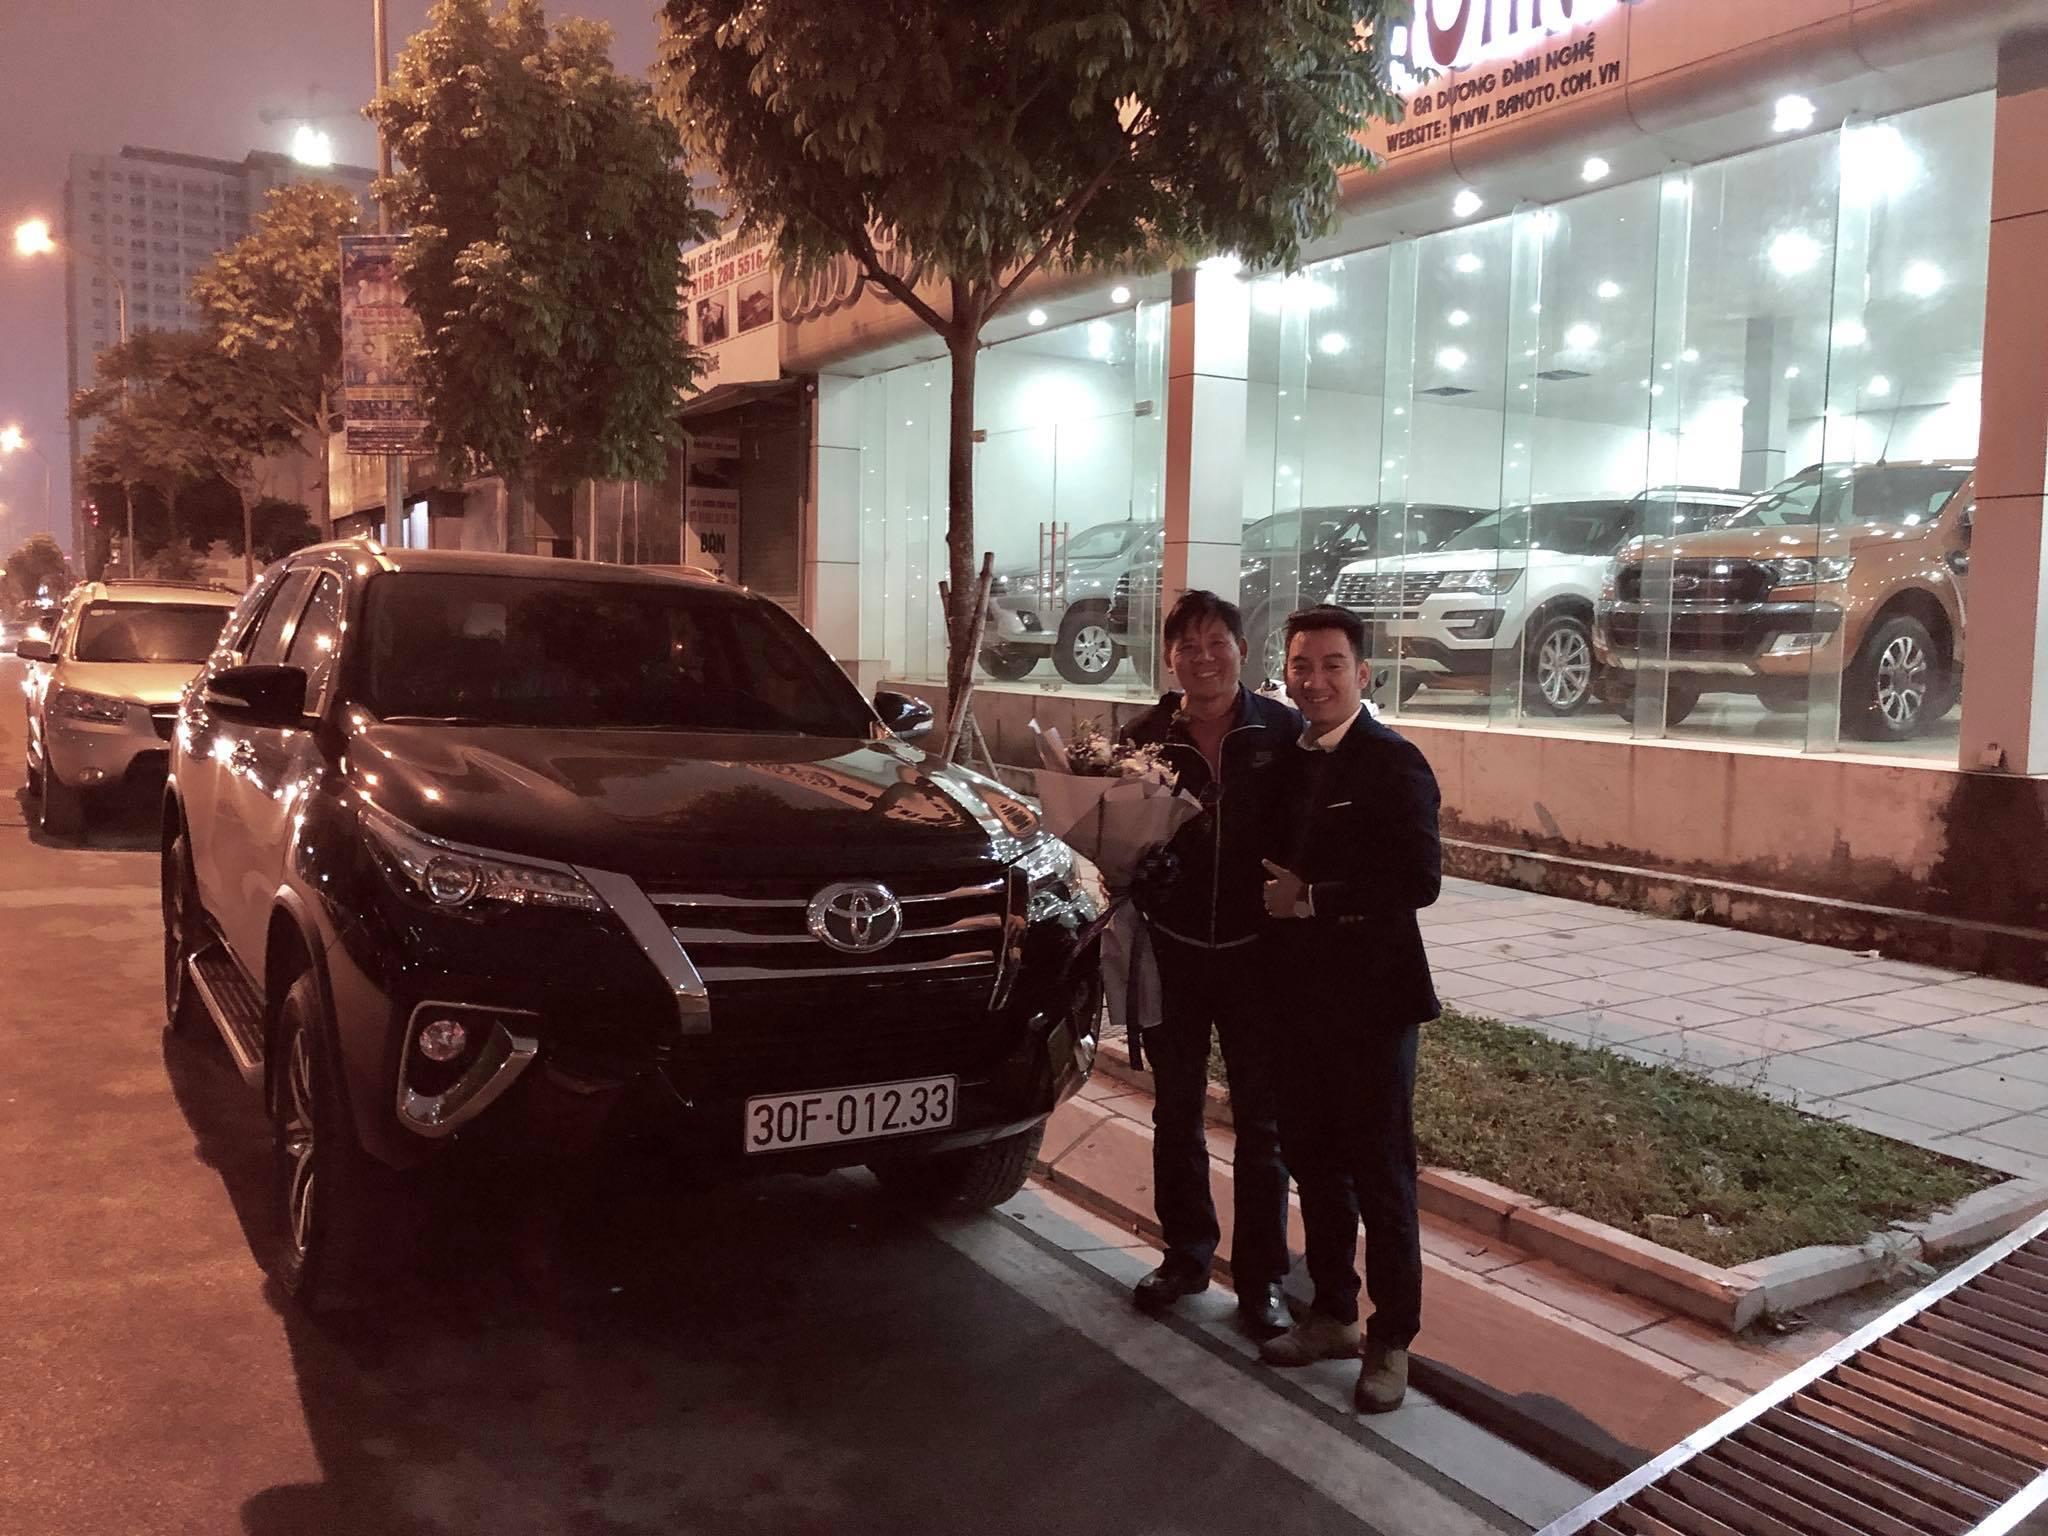 Toyota Fortuner 2017 30E-012.xx